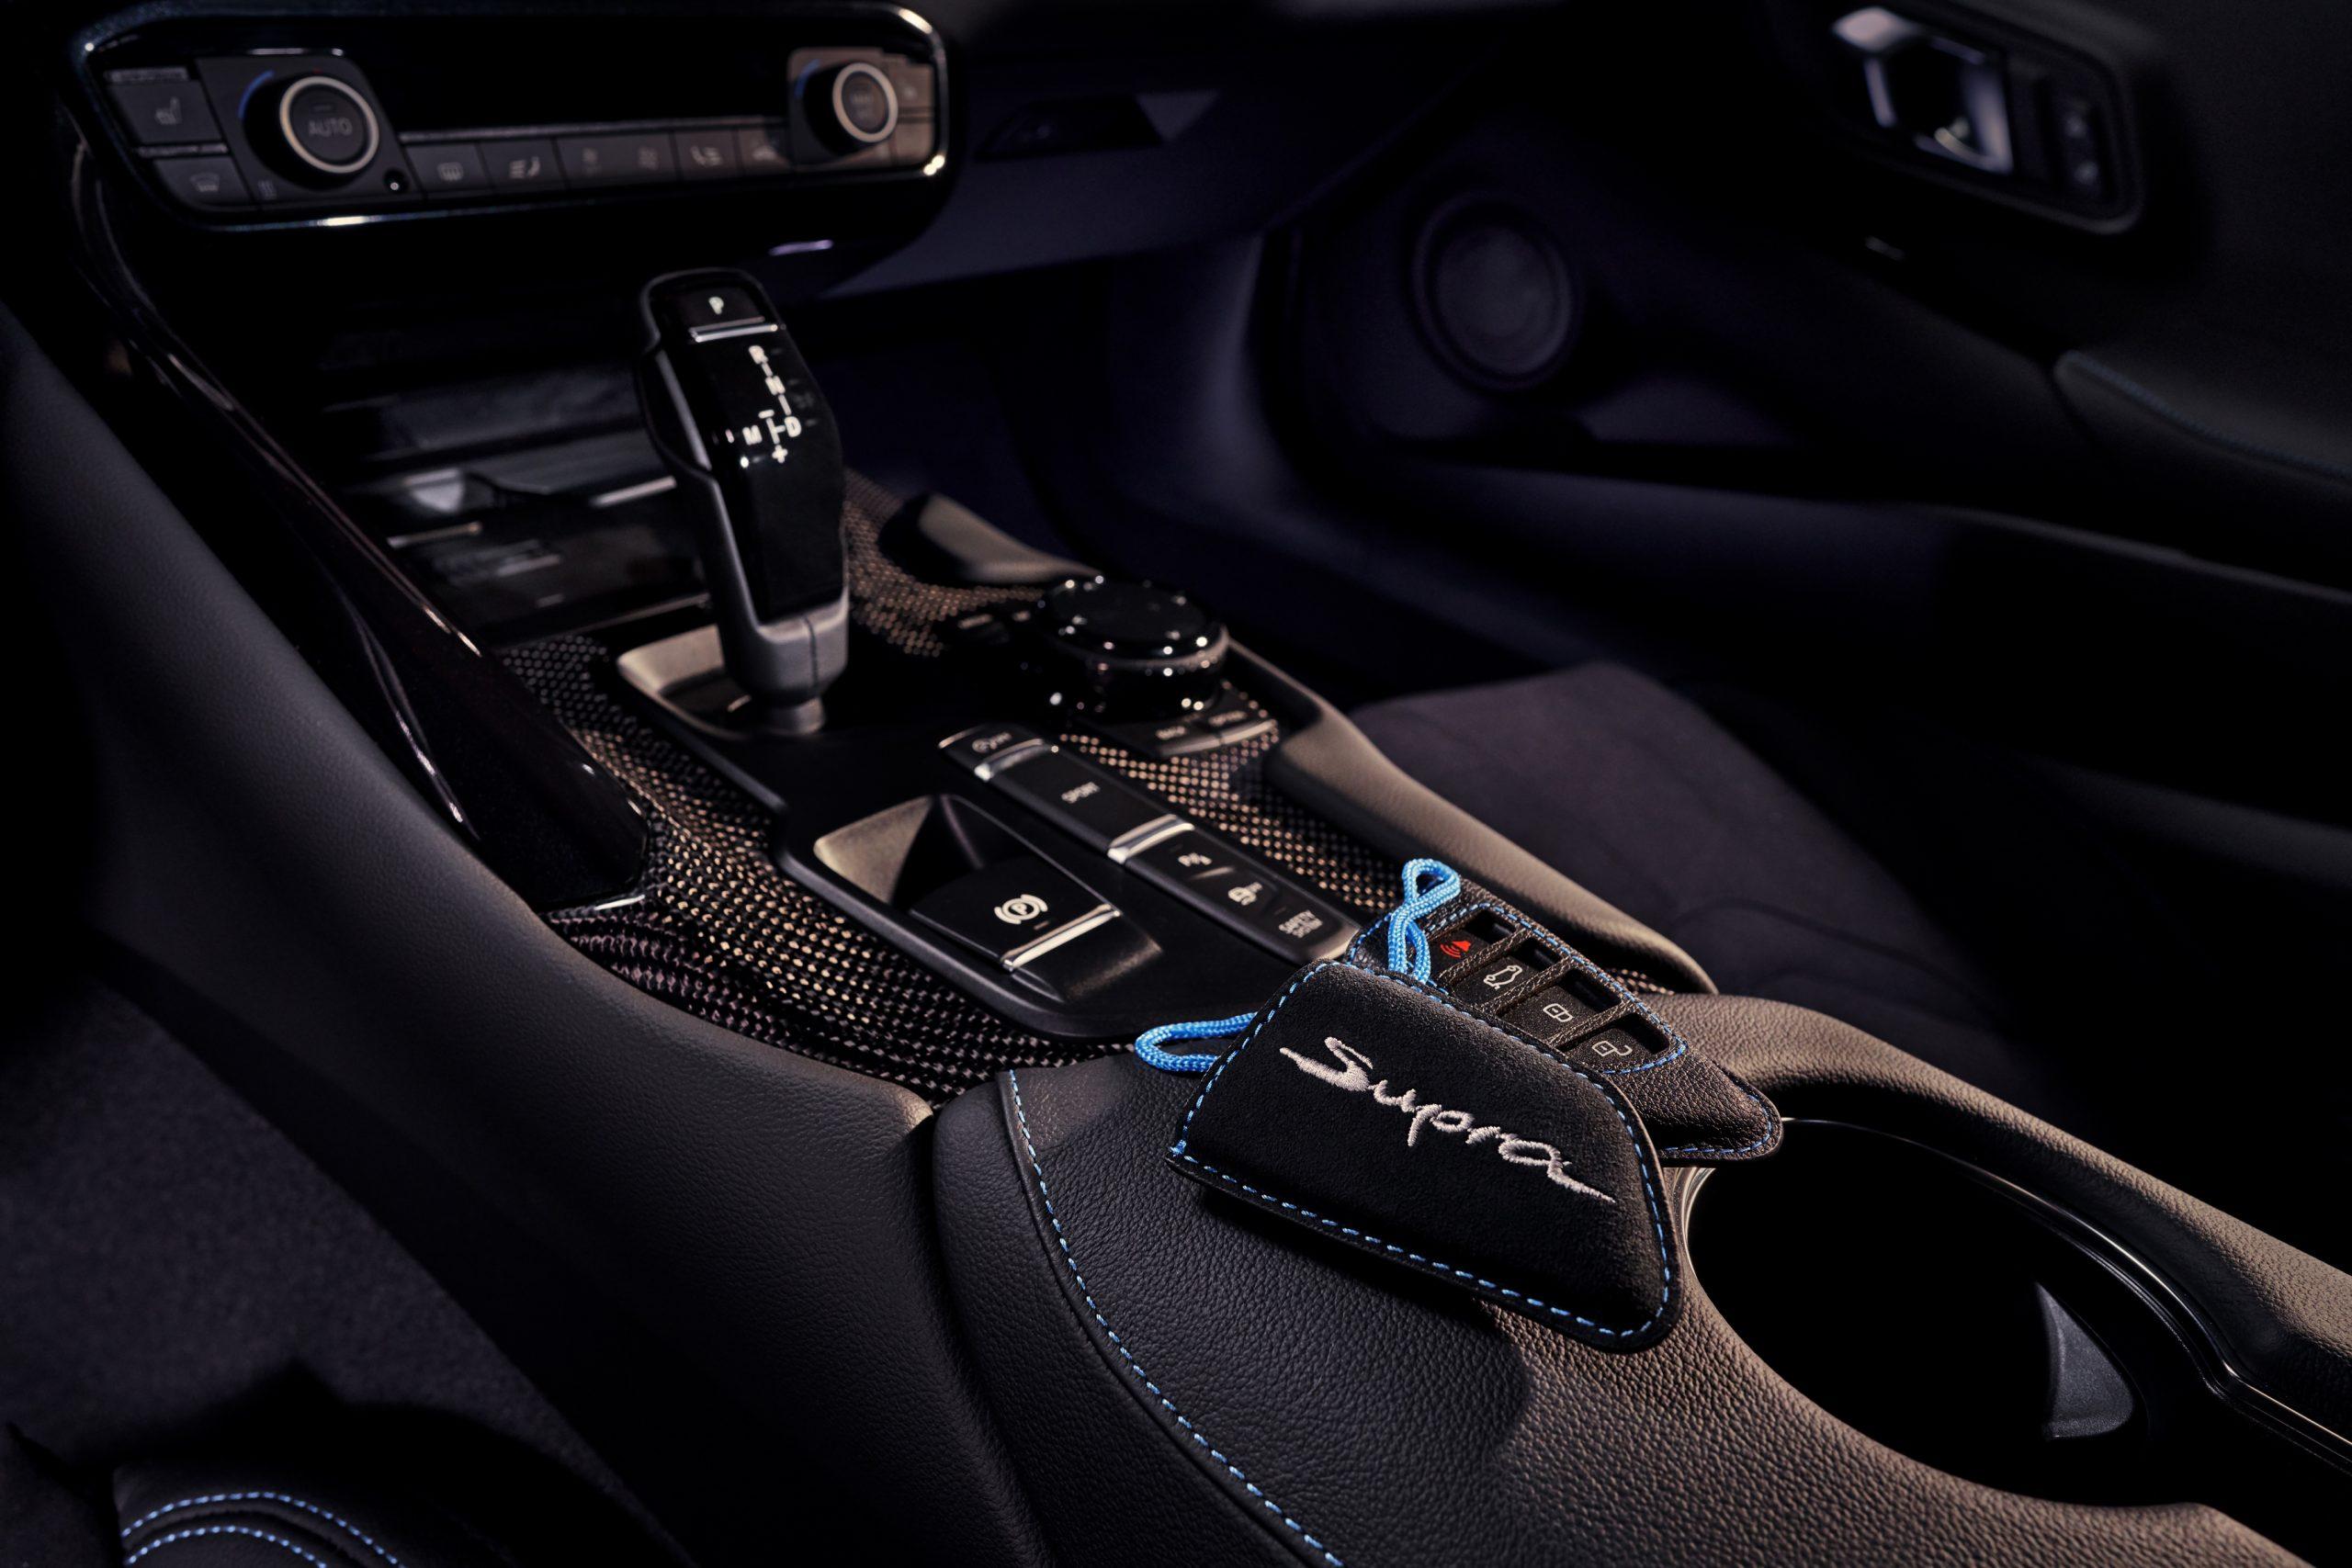 2021-GR-Supra-A91-Edition-Interior_002-scaled.jpg